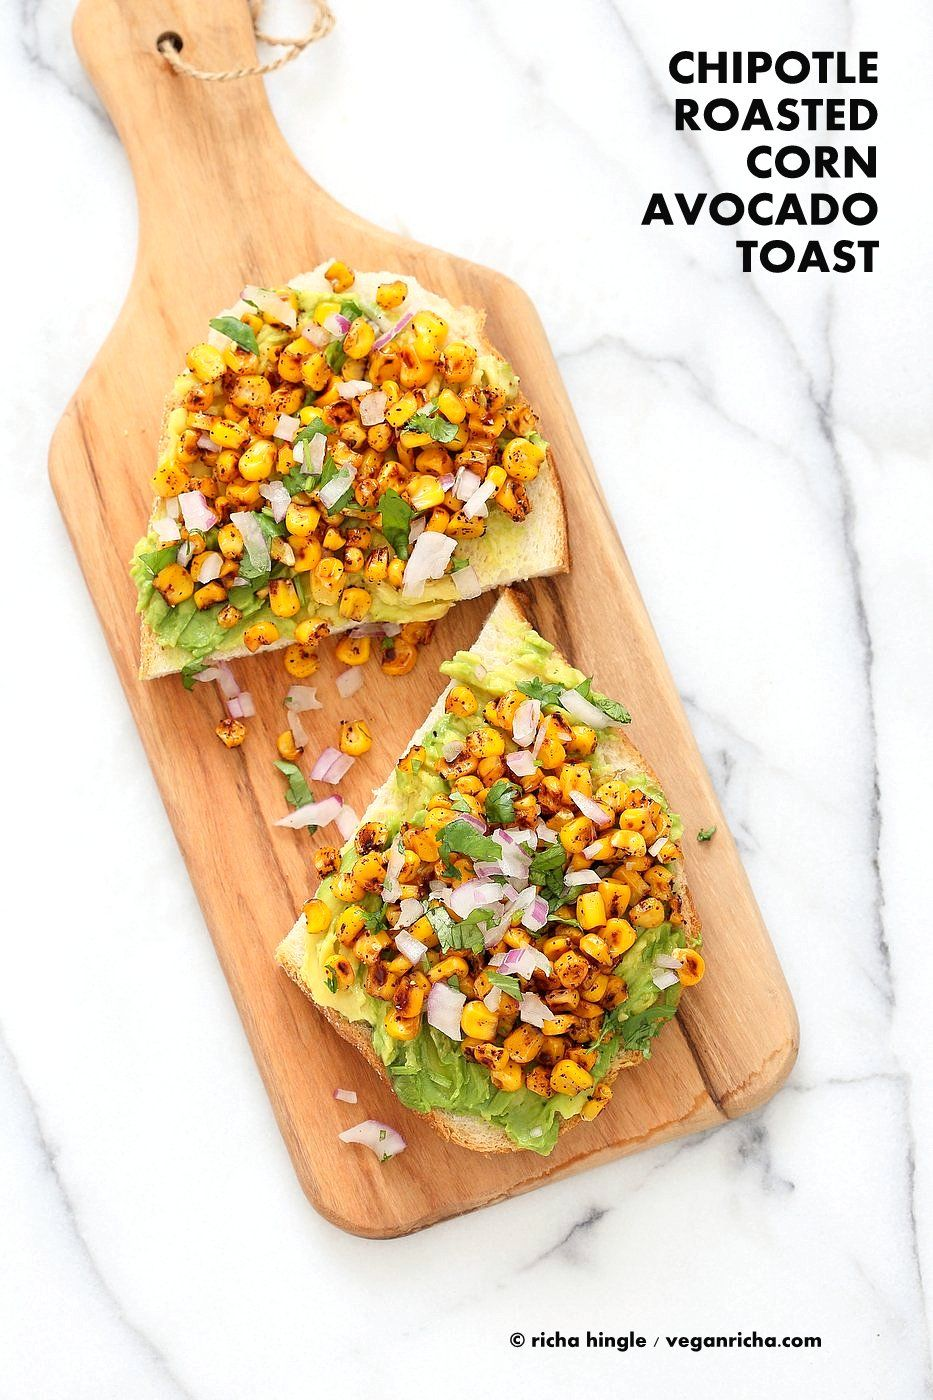 Chipotle Roasted Corn Avocado Toast Recipe Vegan